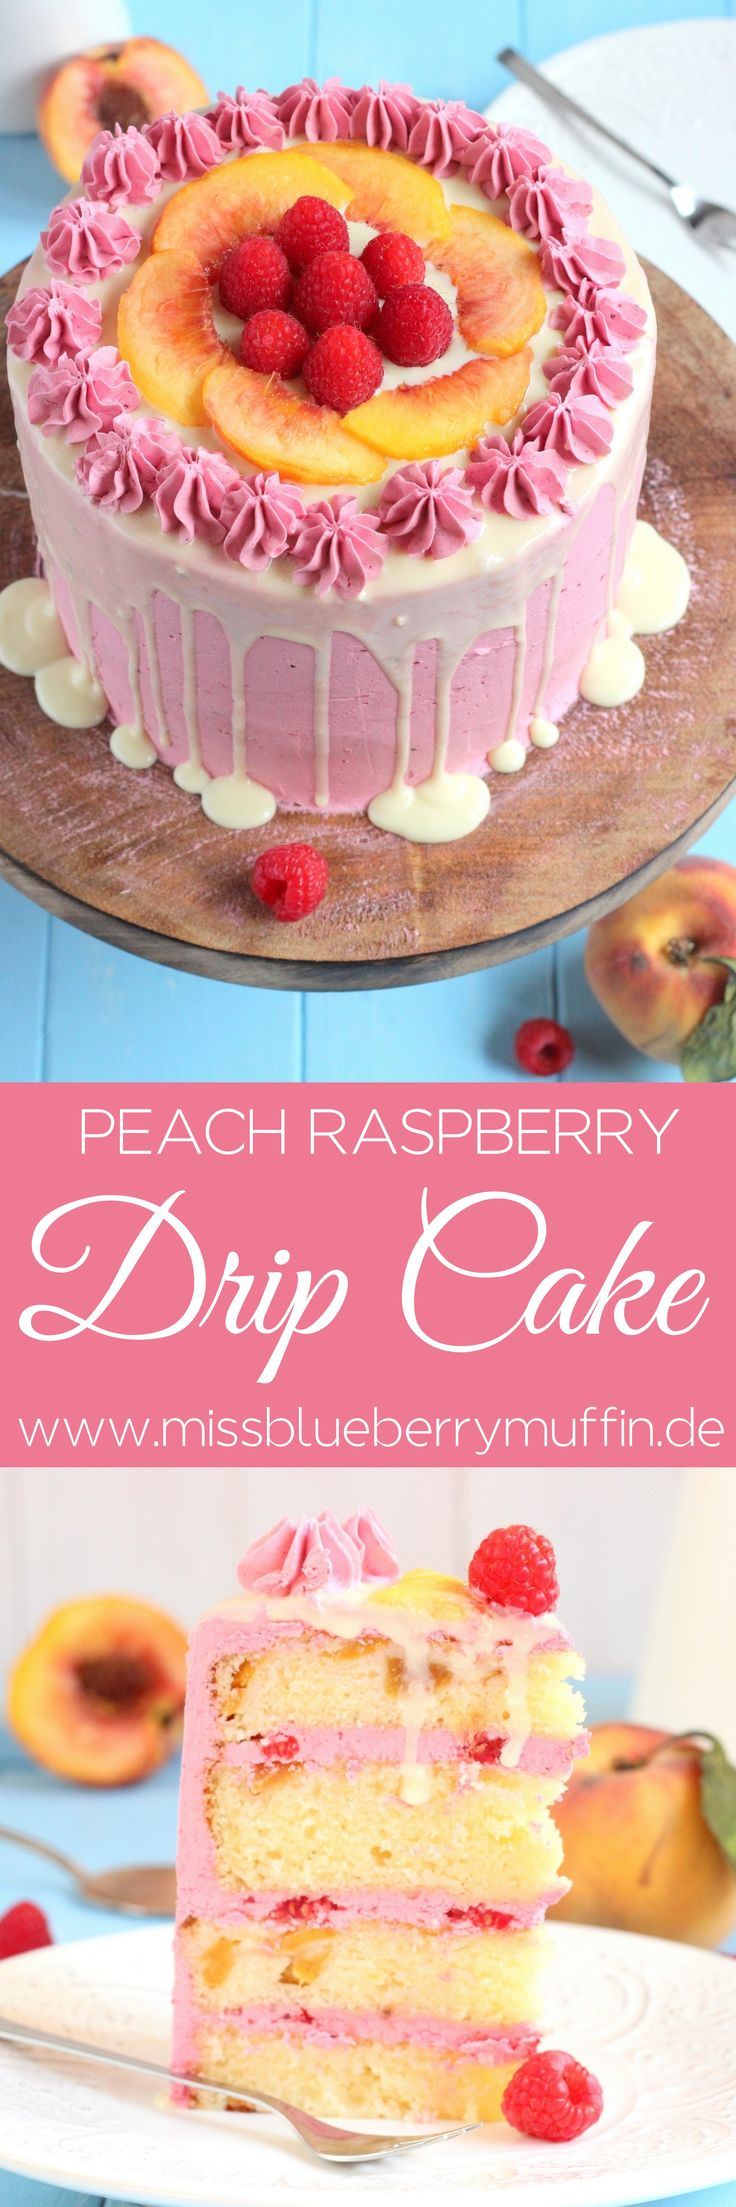 Pfirsich Himbeer Torte // Peach Raspberry Drip Cake <3